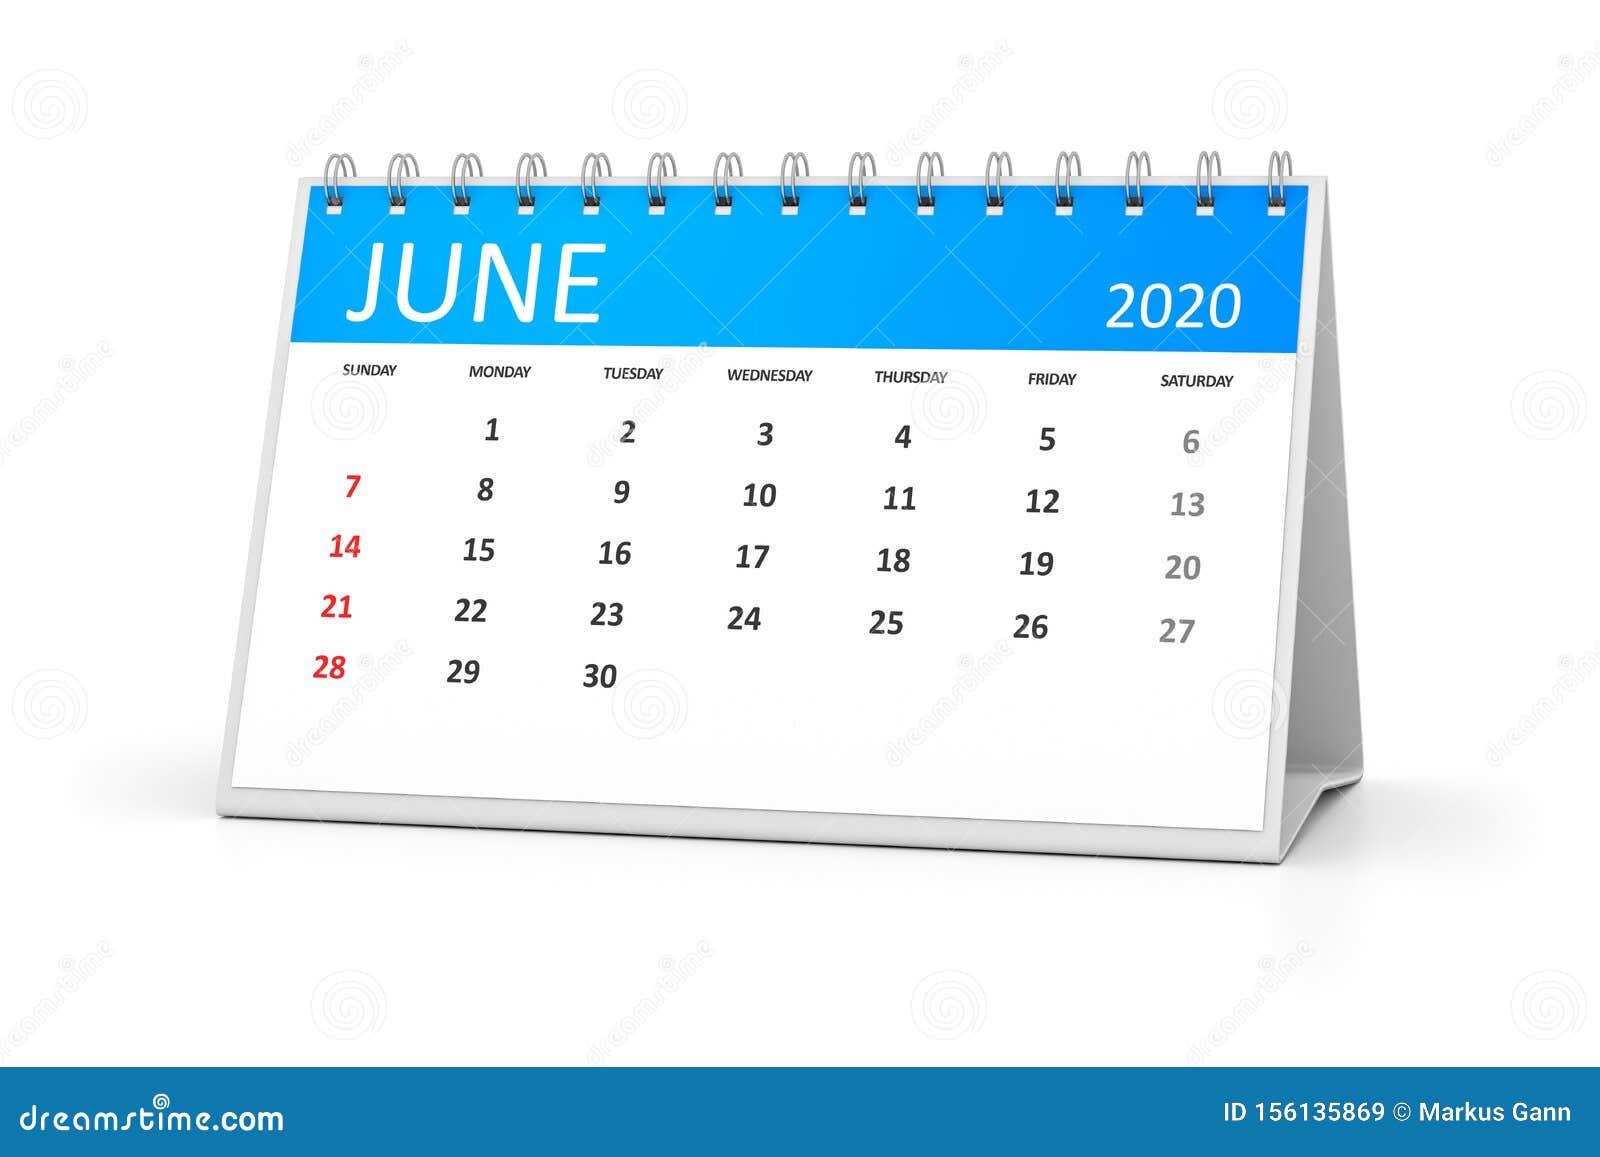 June 23 2020 Events.Table Calendar 2020 June Stock Illustration Illustration Of